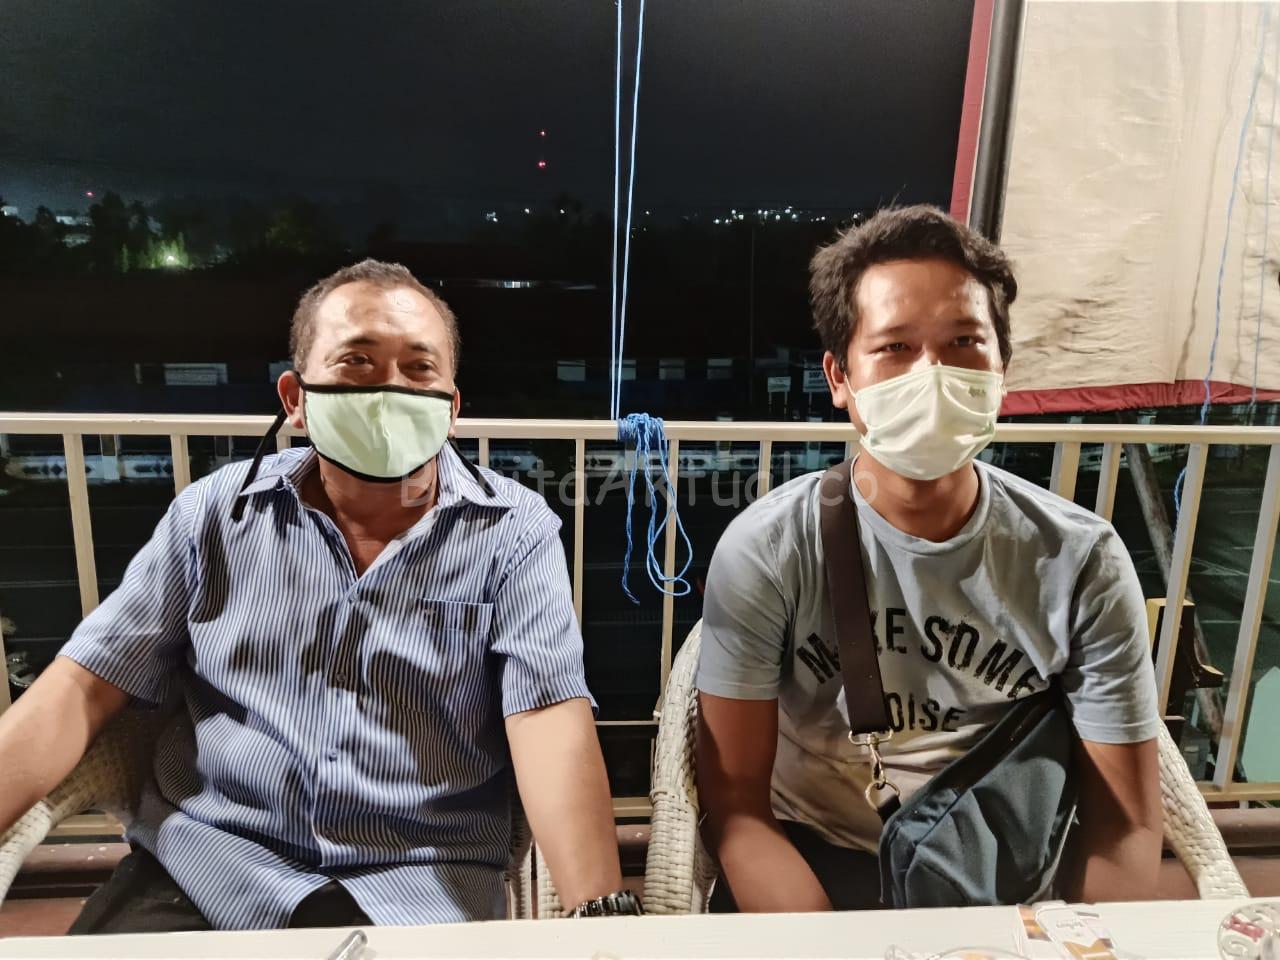 Polres Manokwari Bersama Polda PB Berhasil Tangkap 10 Pelaku Begal Yang Berusia Dibawah Umur 8 IMG 20200506 WA0029